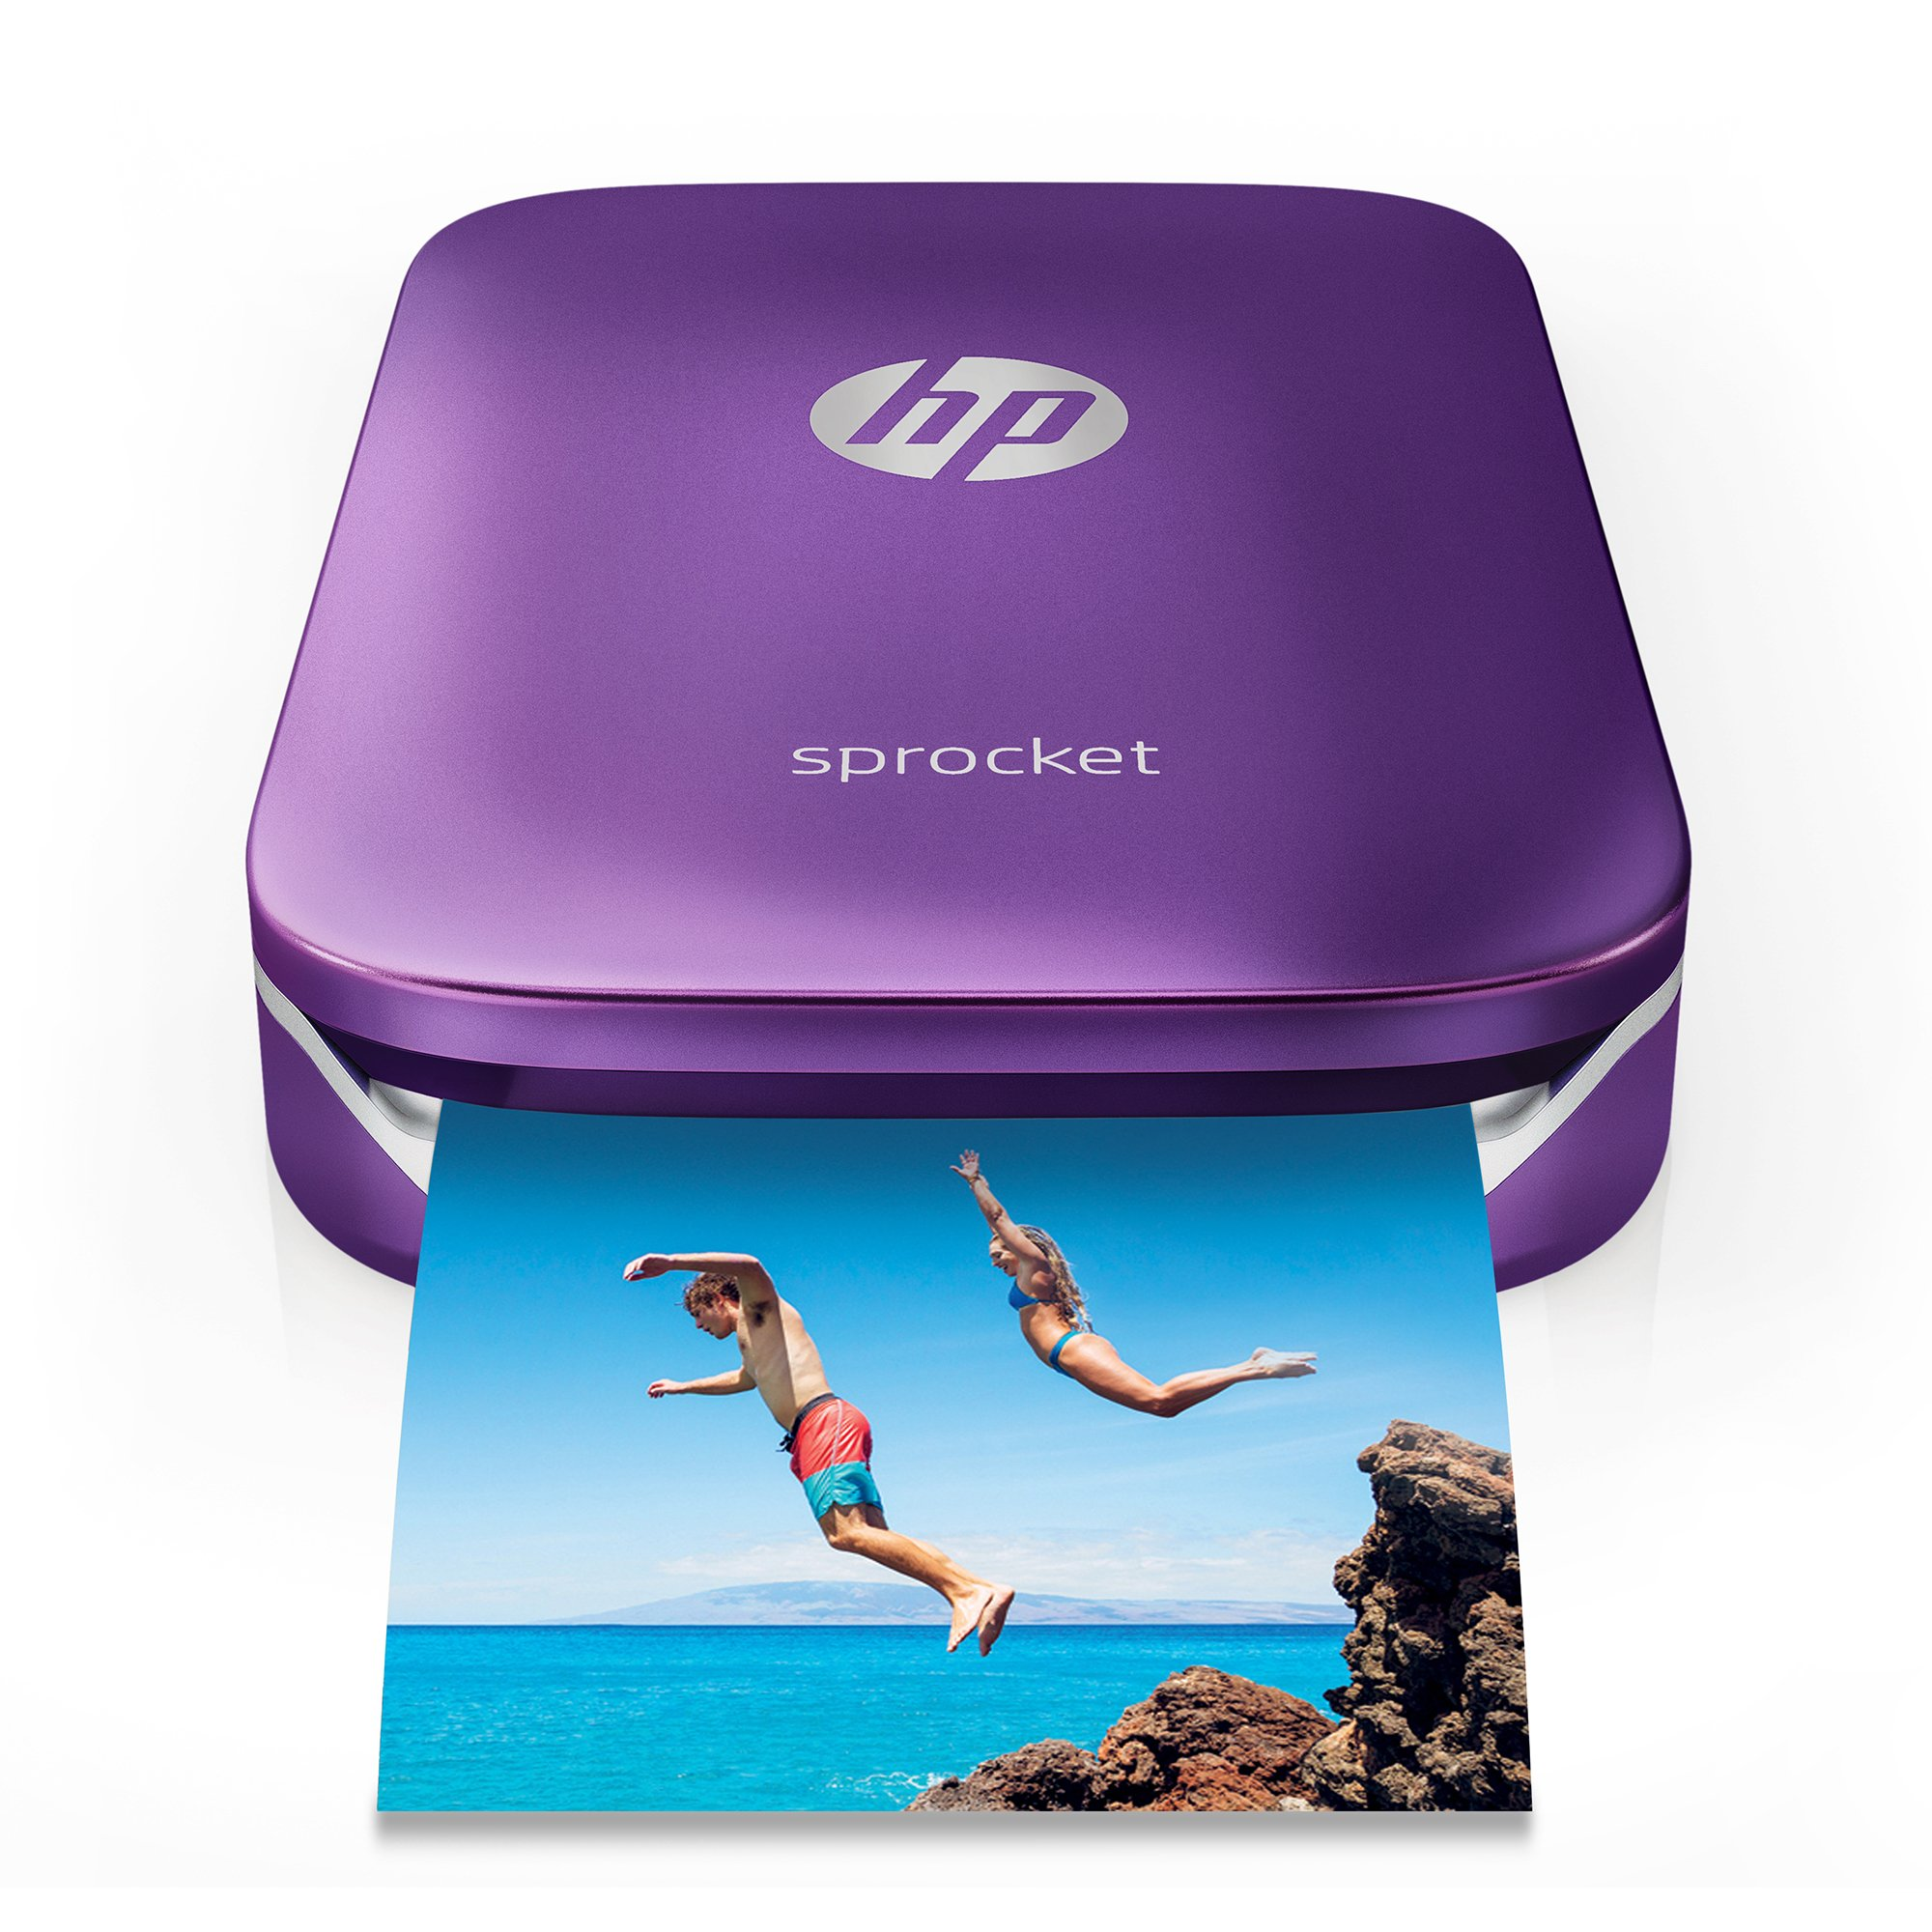 HP Sprocket Portable Photo Printer, Print Social Media Photos on 2x3'' Sticky-Backed Paper - Purple (Z9L25A)